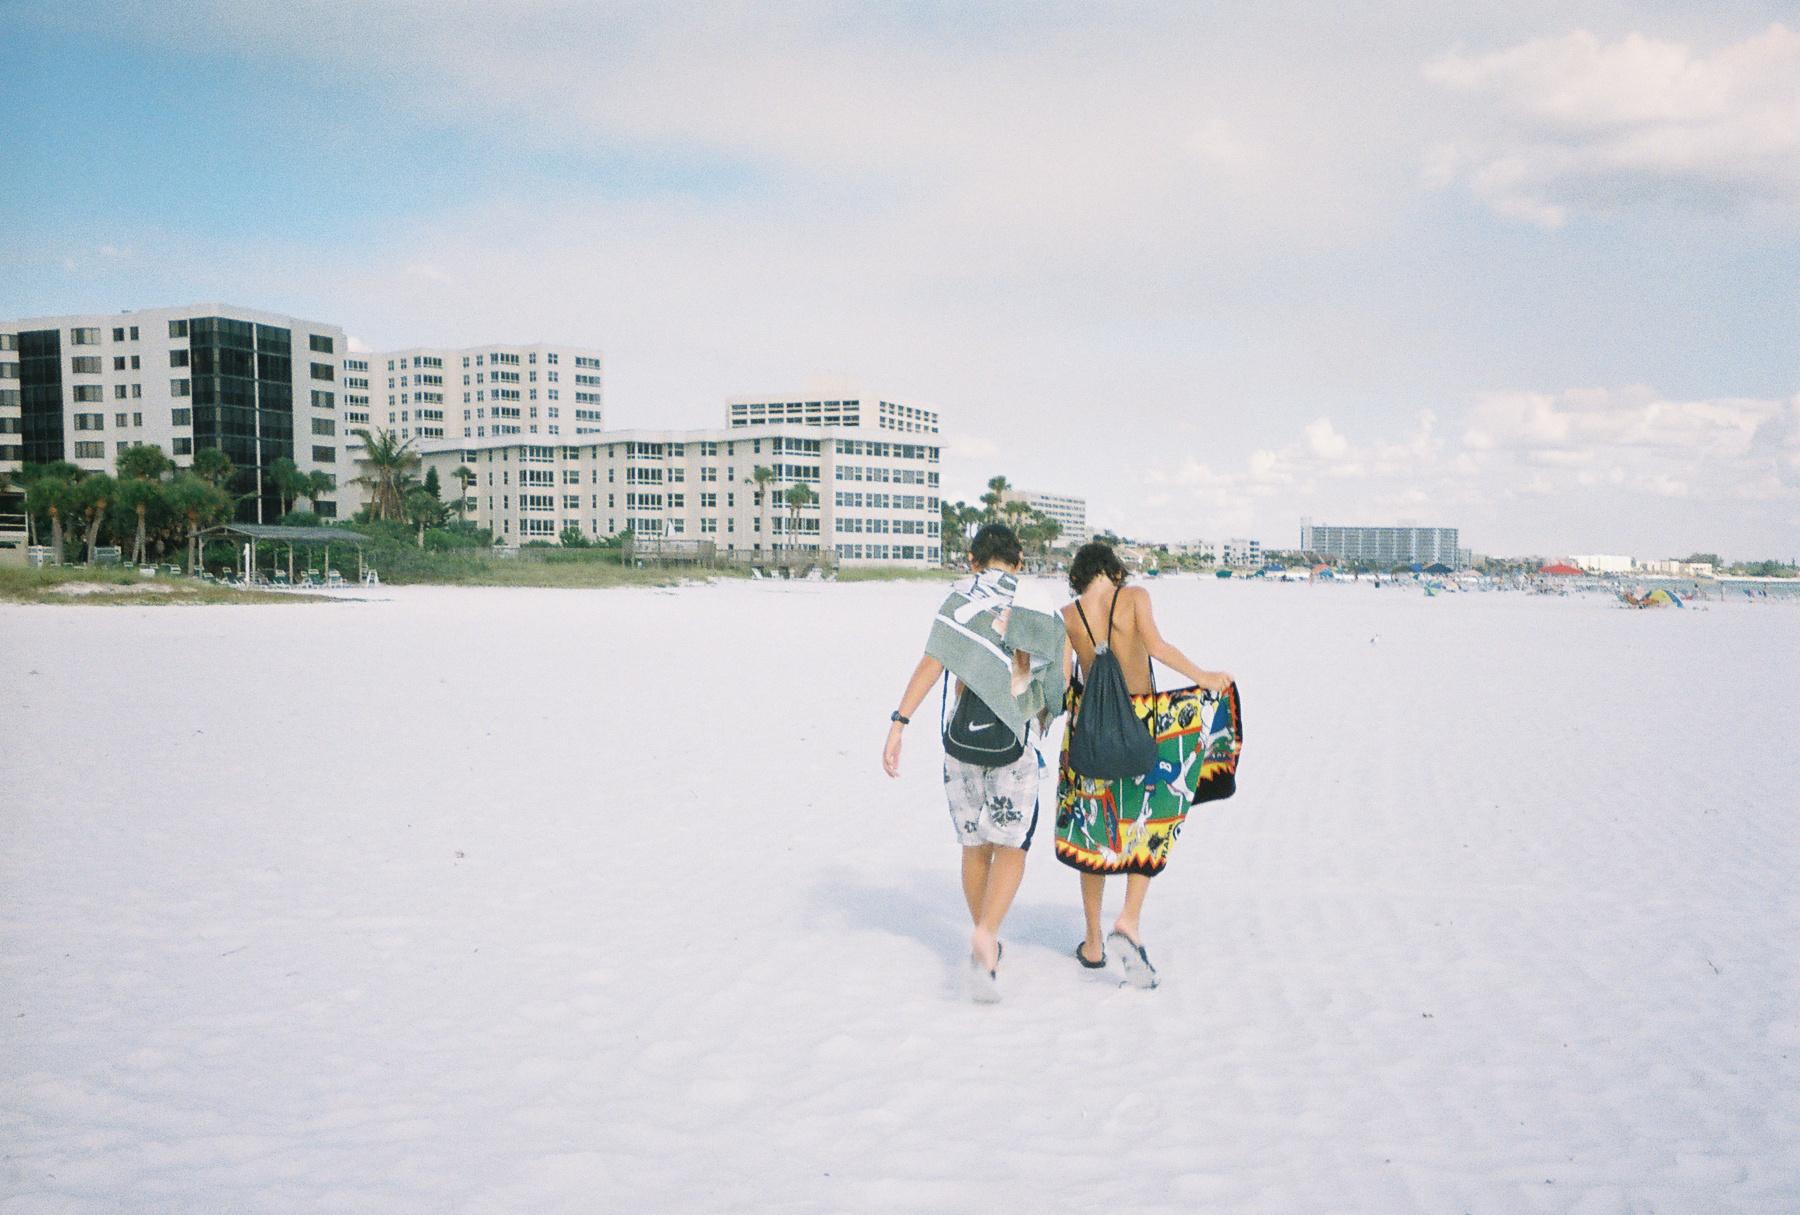 Sarasota-Bradenton-Venice Pictures (Englewood, Siesta Key ...